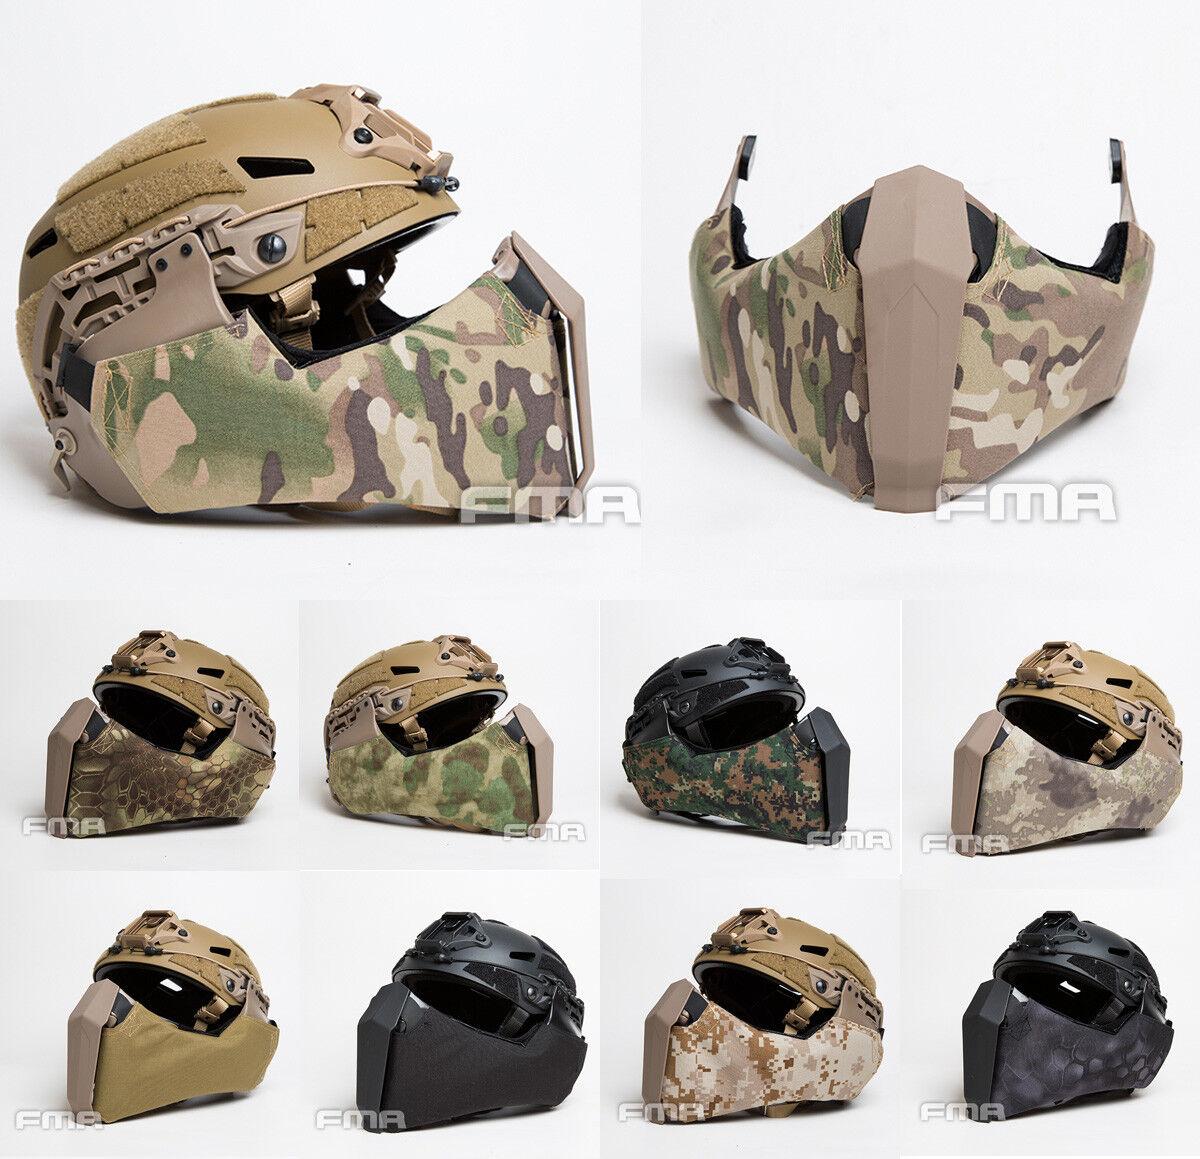 FMA Gunsight Mandible Tactical Half Face Mask for Highcut Helmet Side Guide Rail